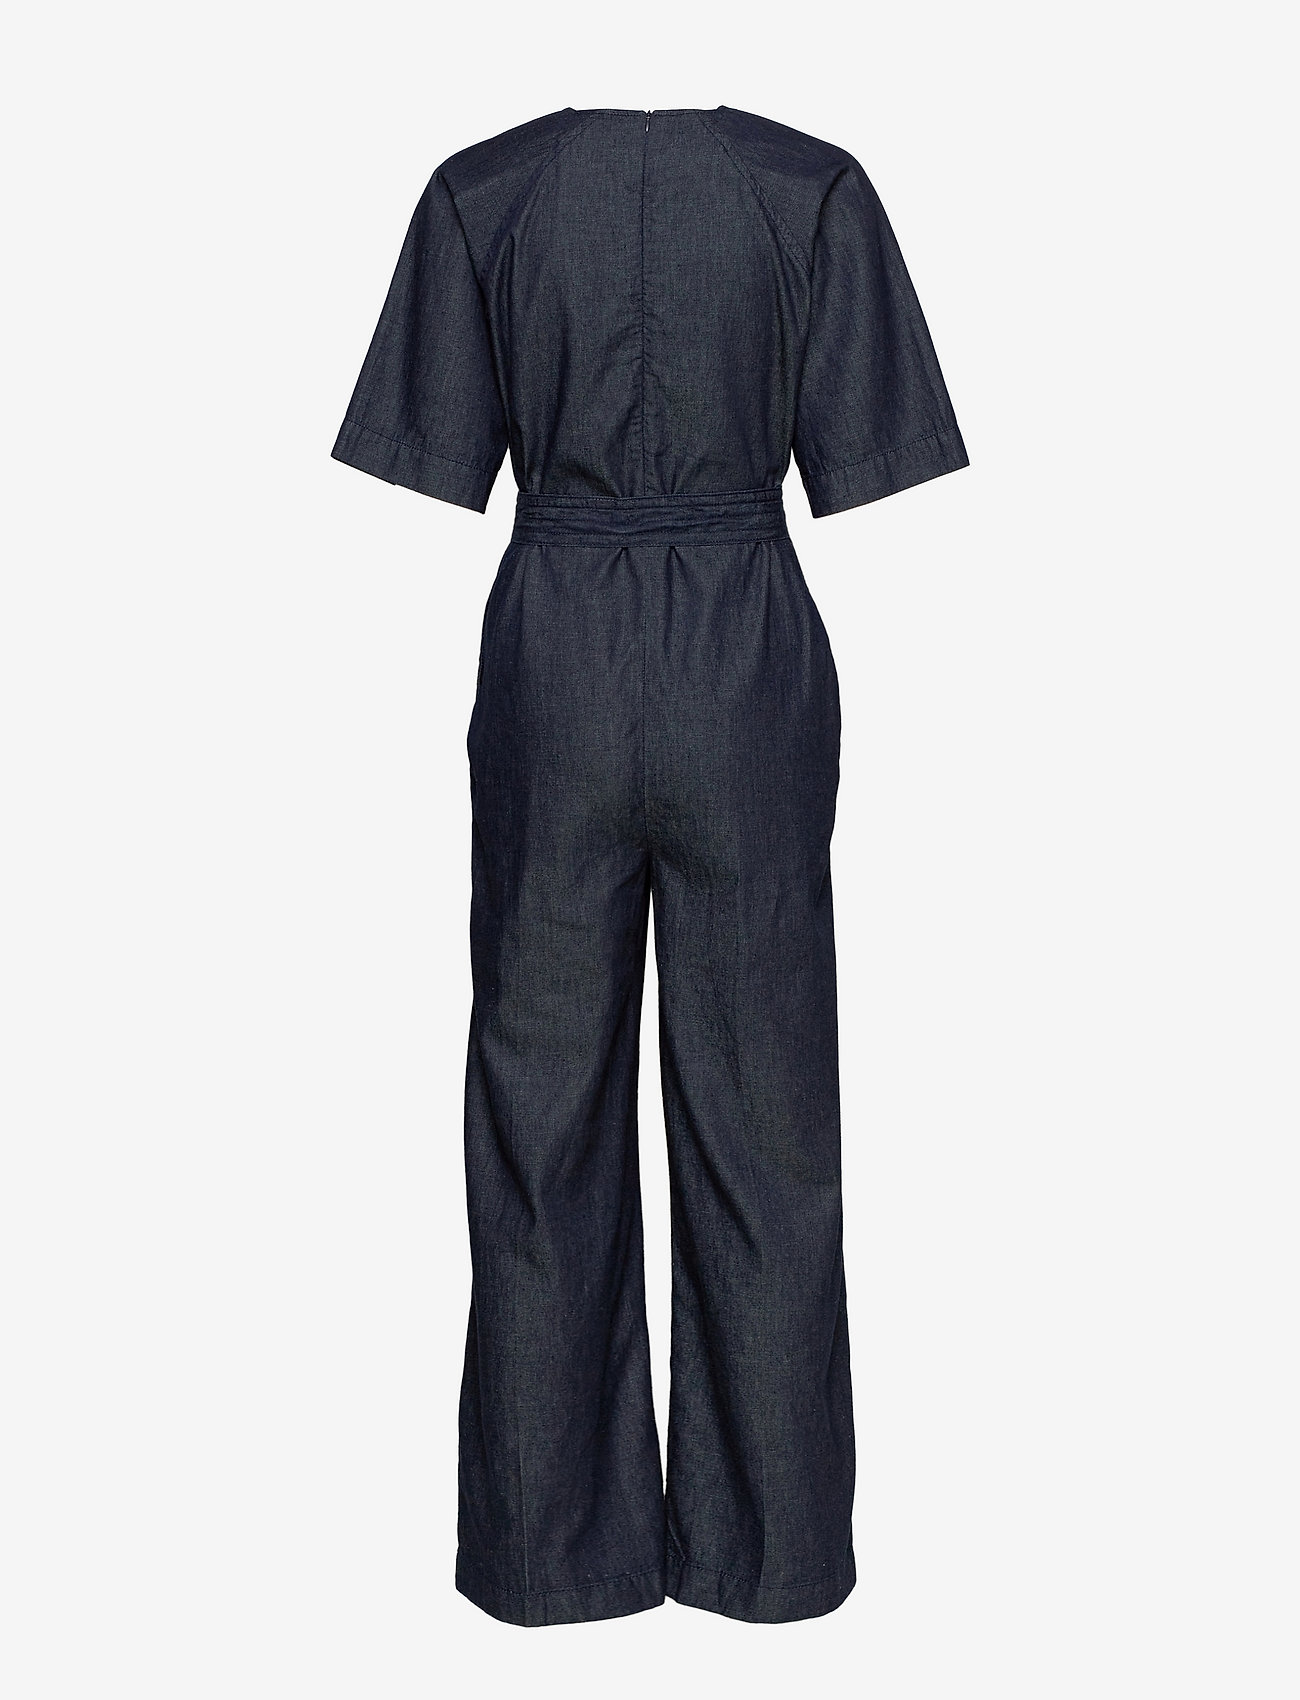 Mads Nørgaard - Fall Indigo Jilda - clothing - unwashed - 1